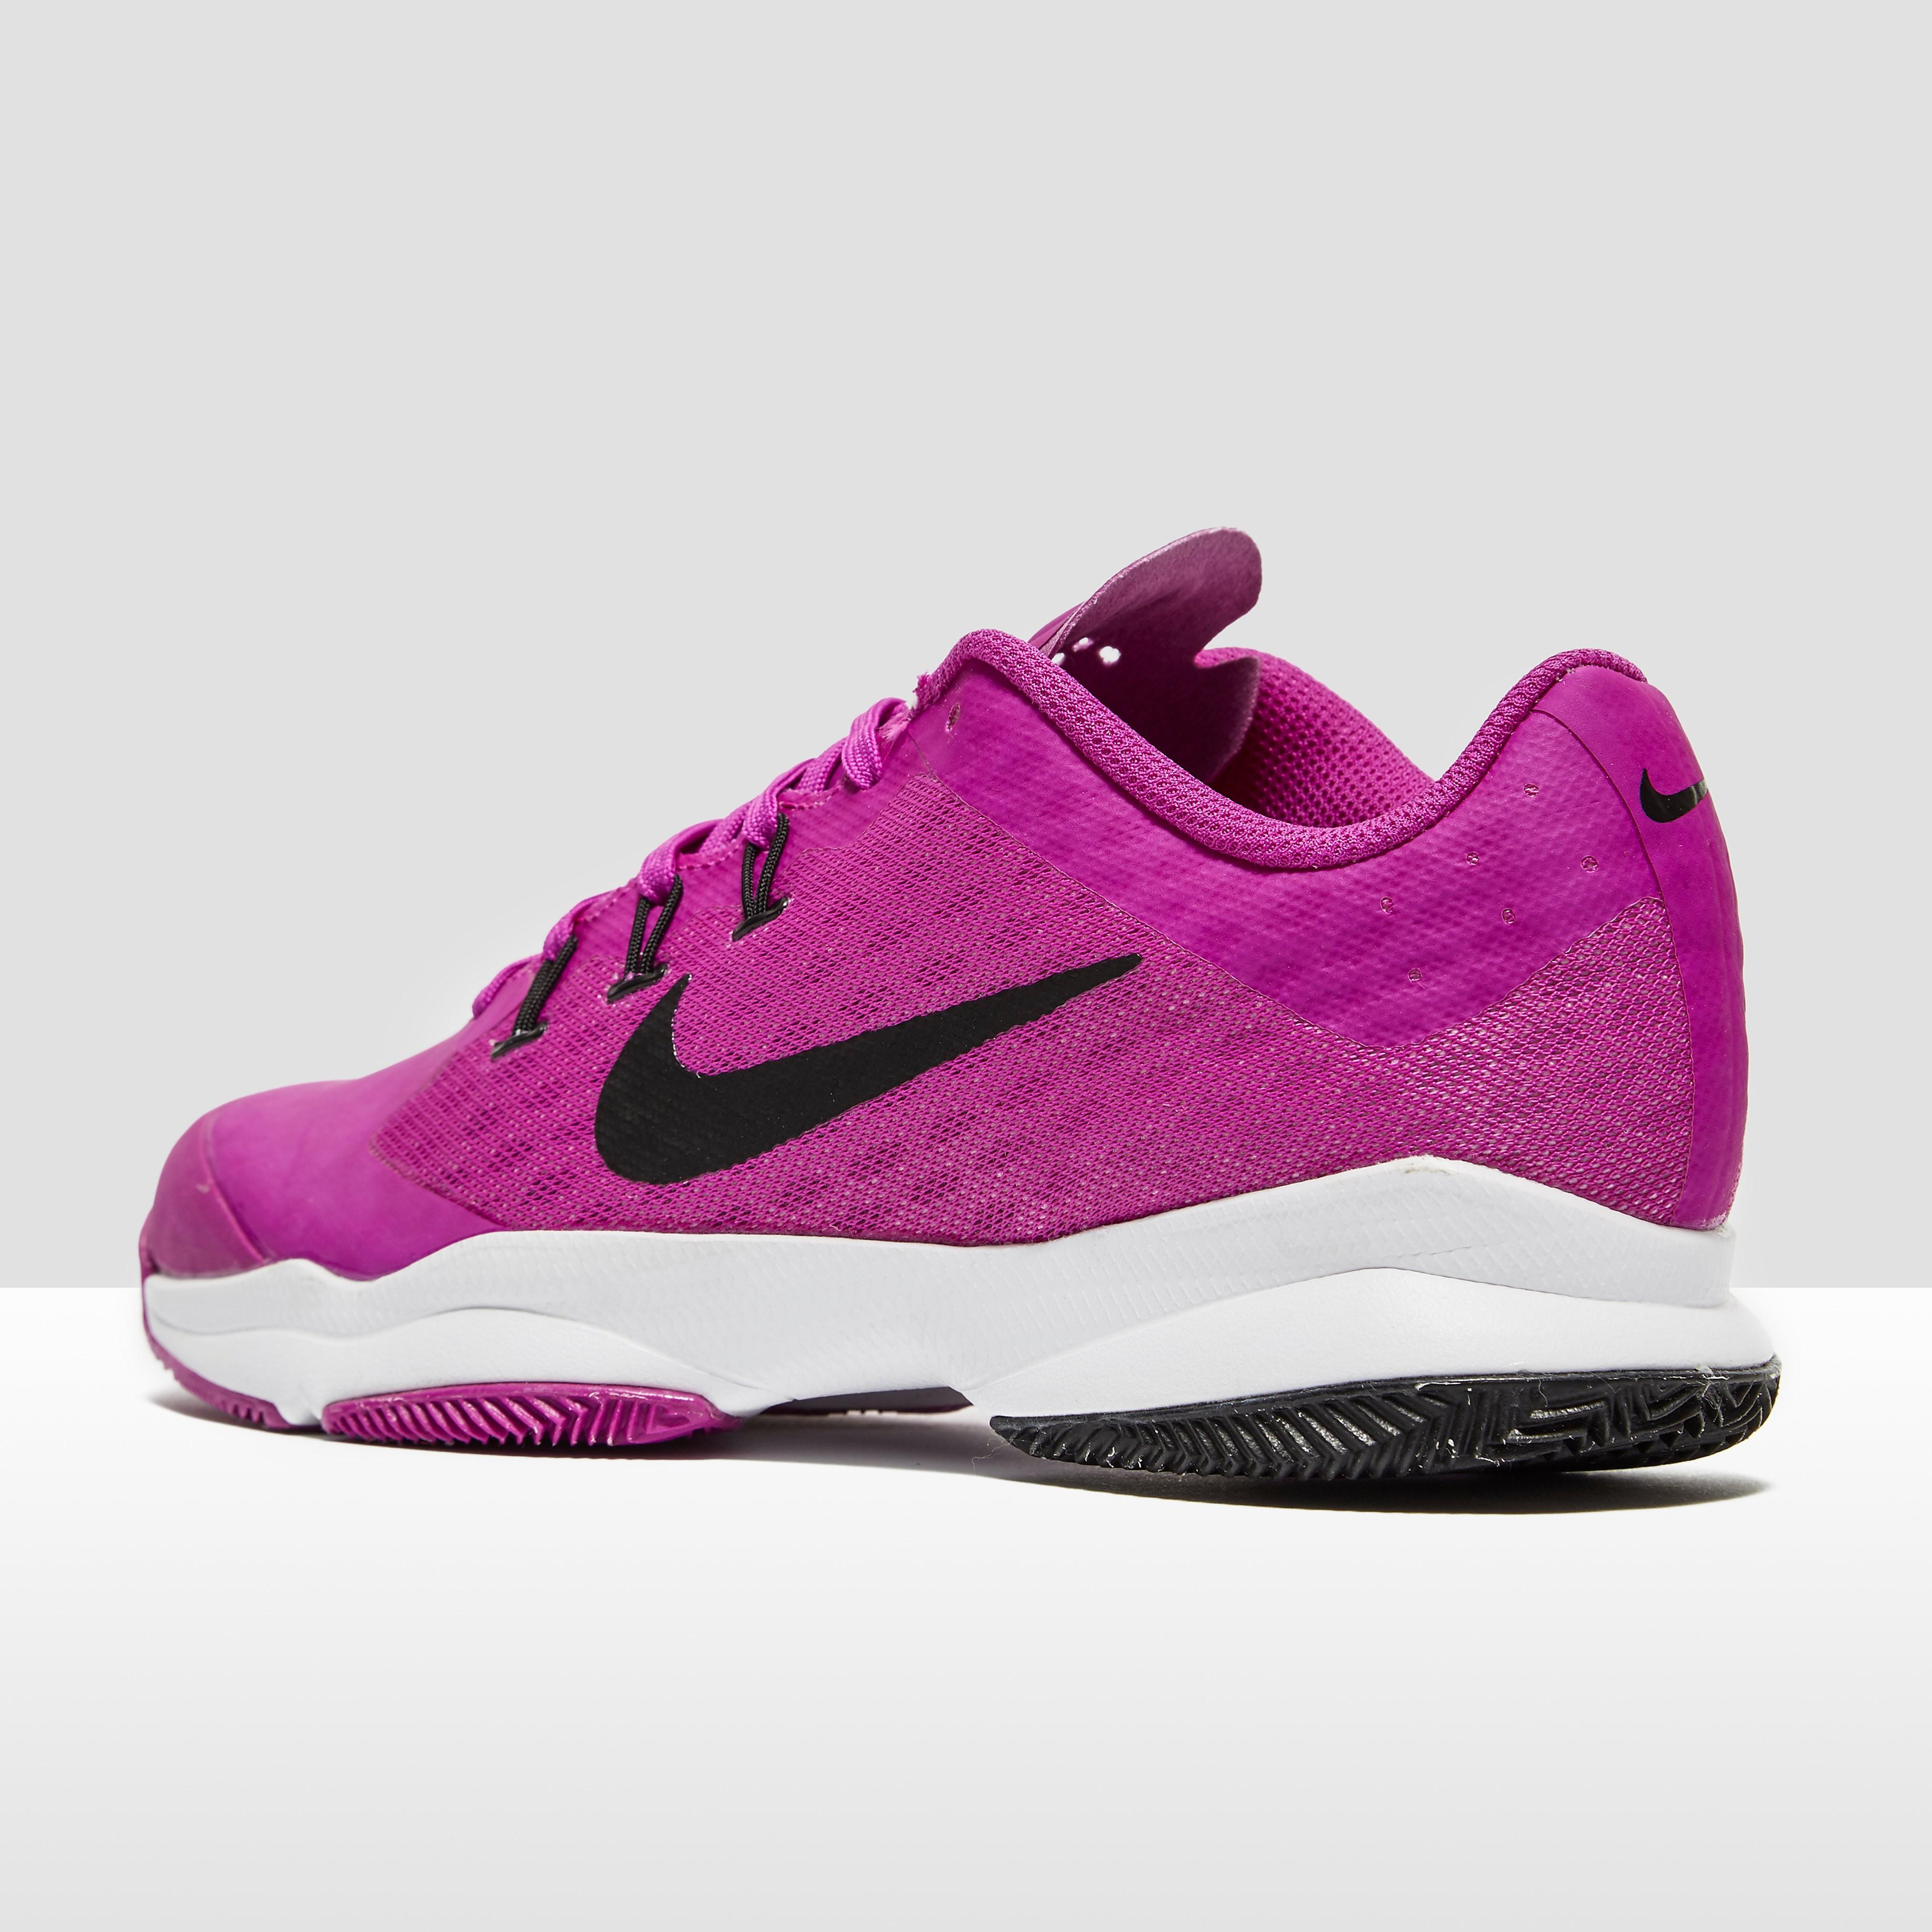 Nike Air Zoom Ultra Women's Tennis Shoes